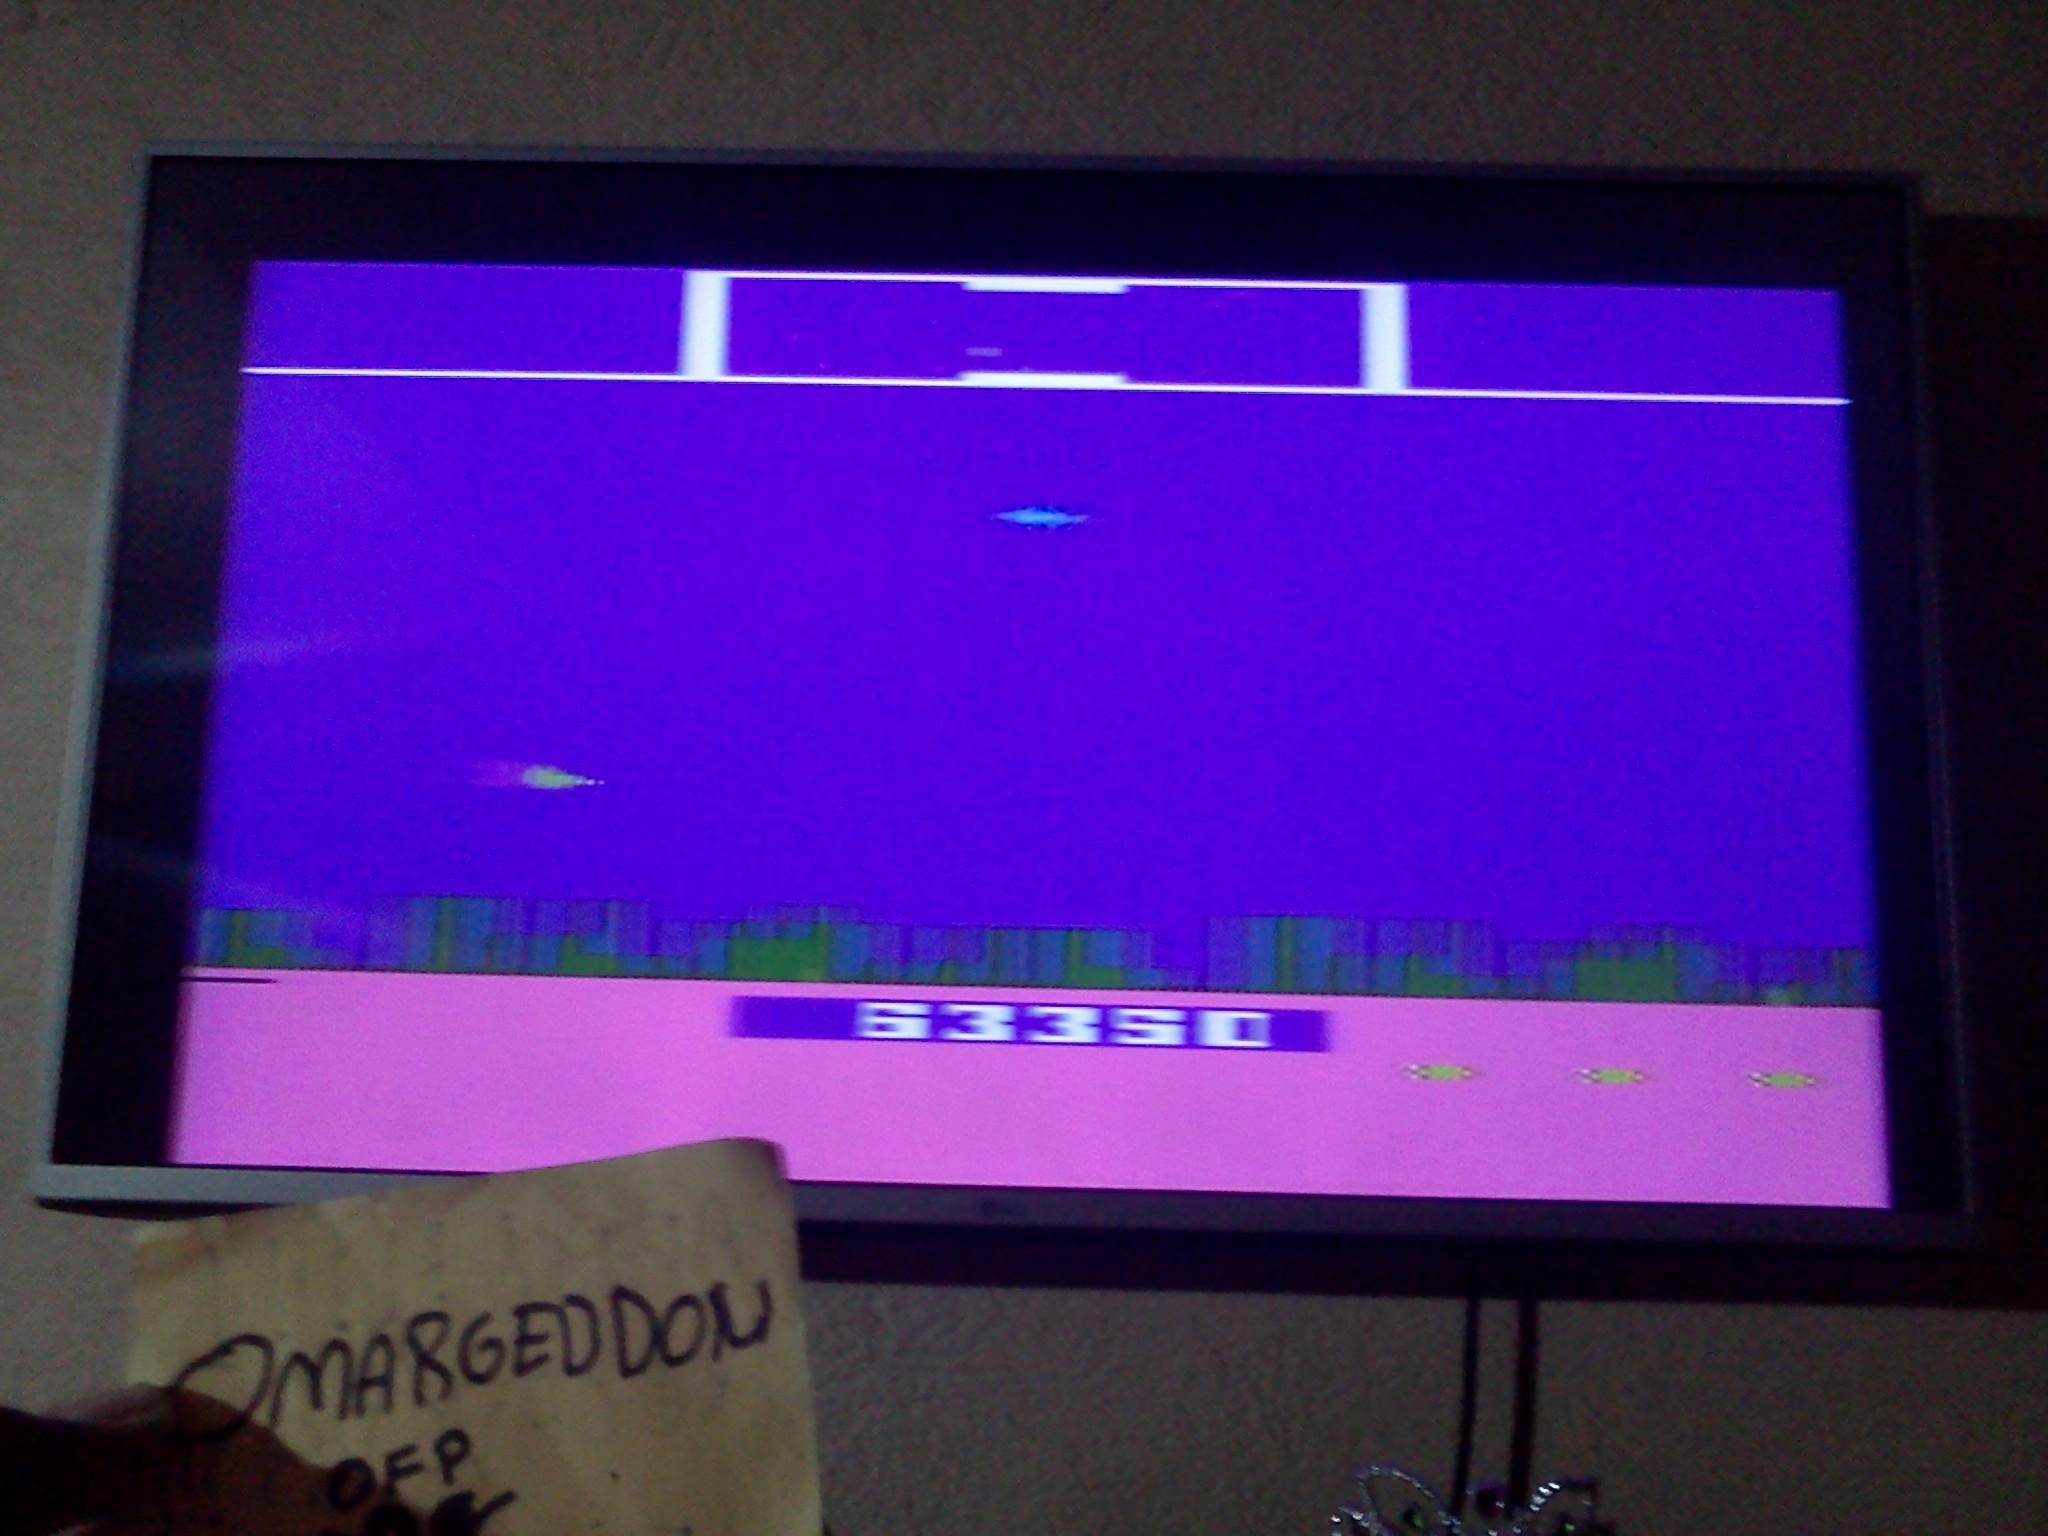 omargeddon: Defender (Atari 2600 Novice/B) 63,350 points on 2016-08-16 21:35:53